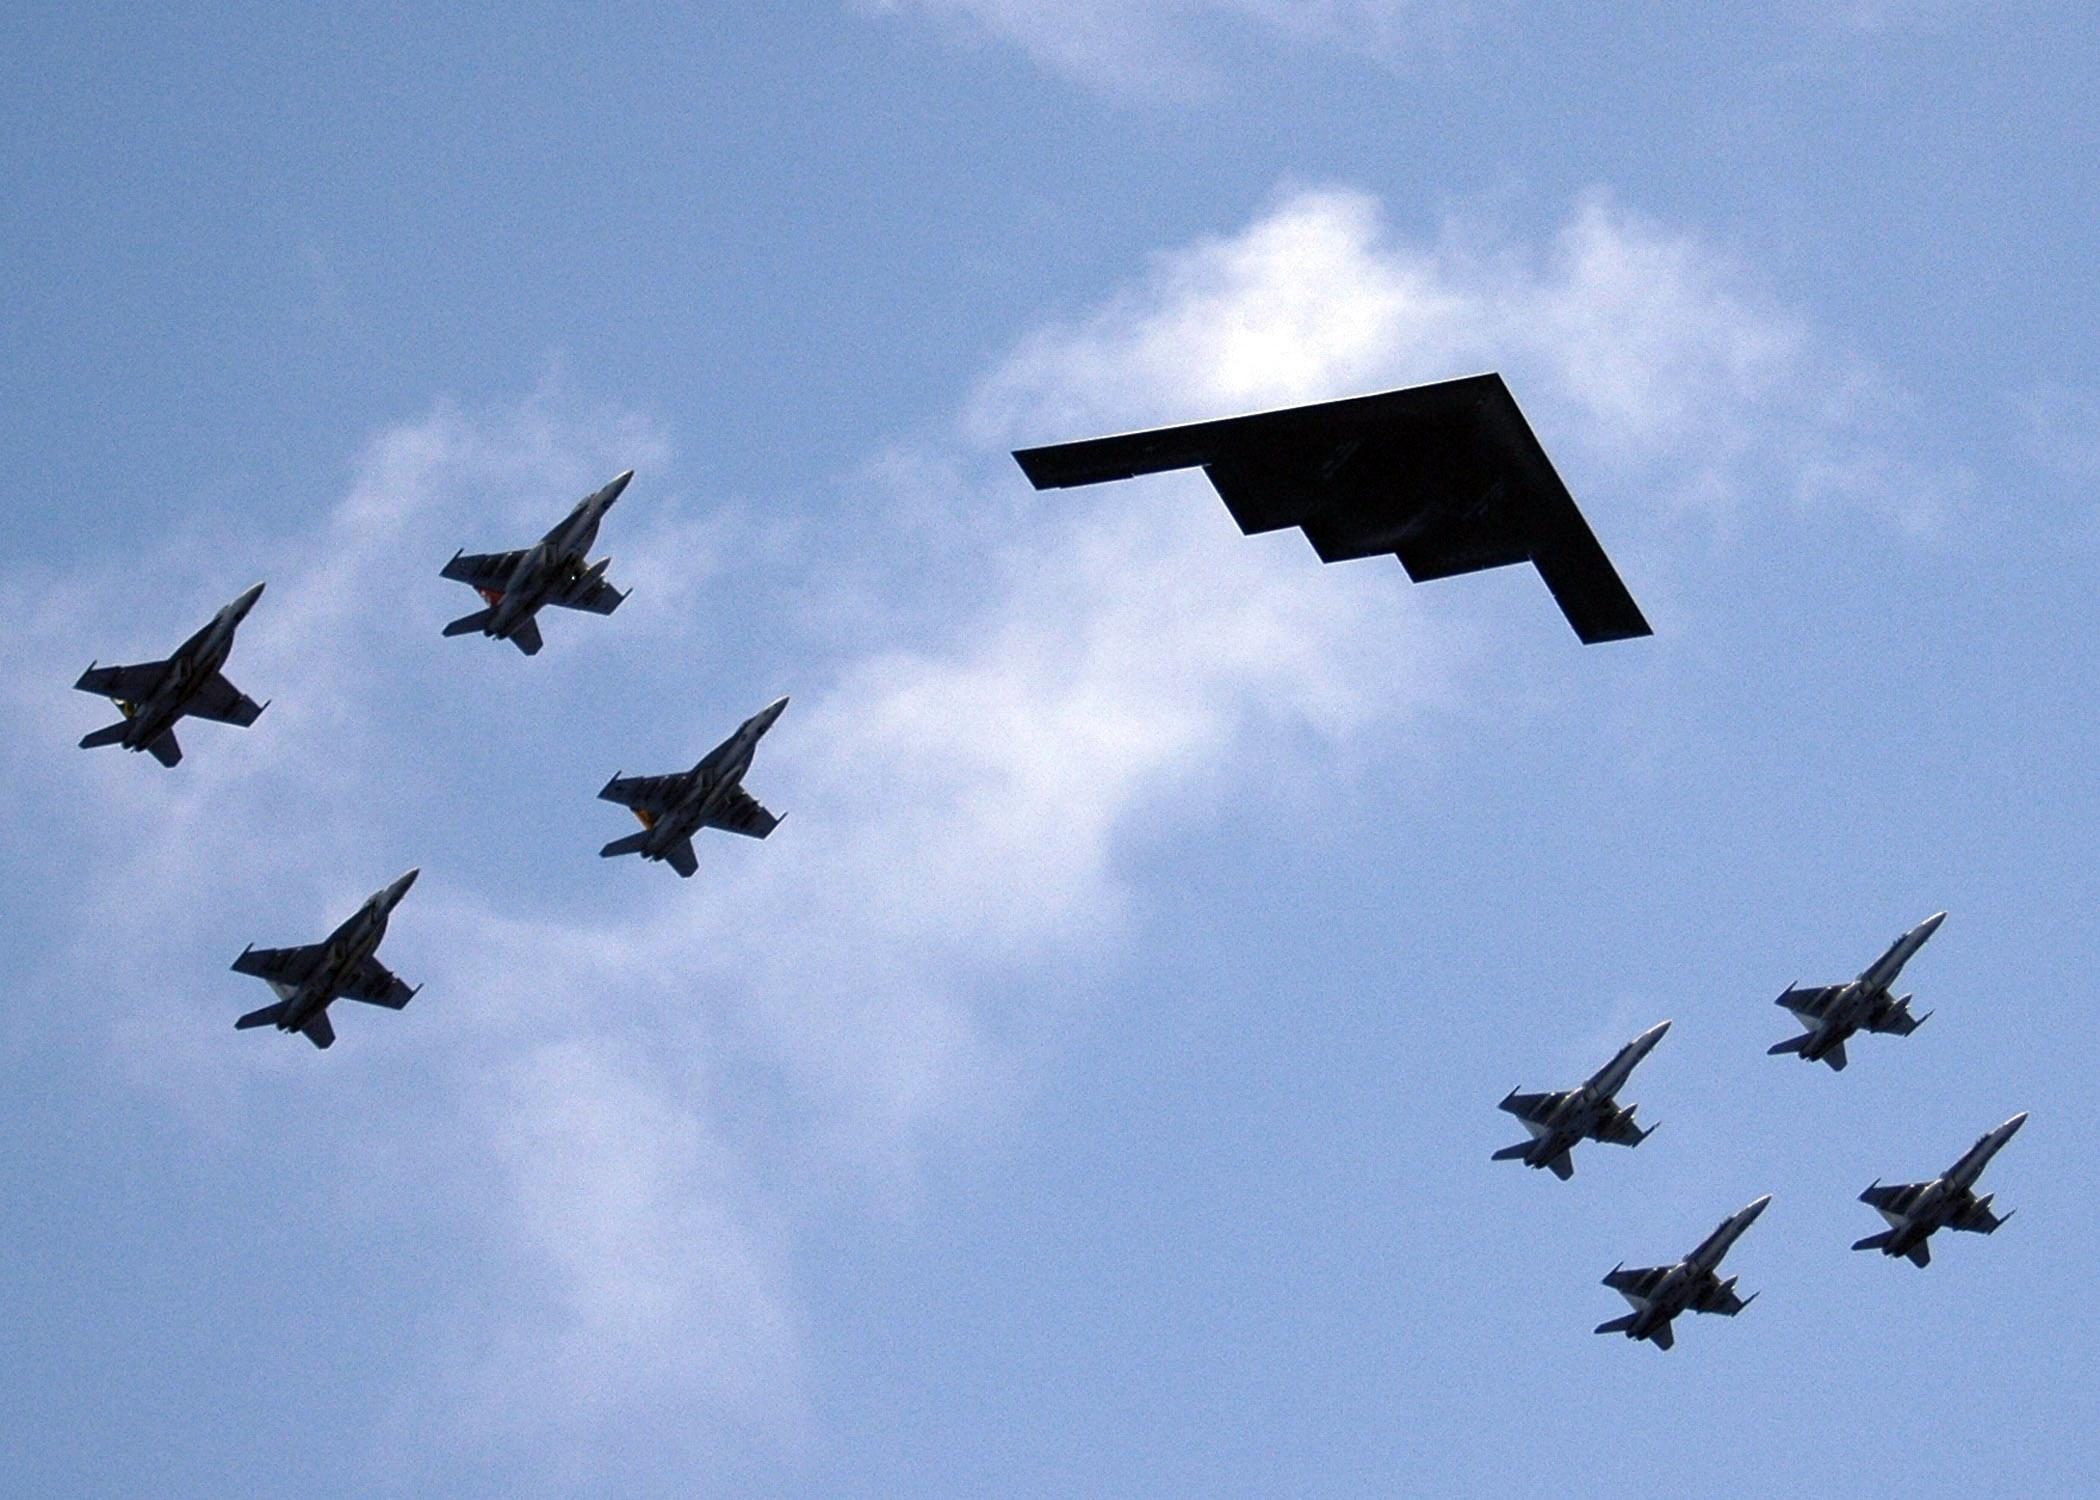 Militär - Air Show  Hintergrundbild